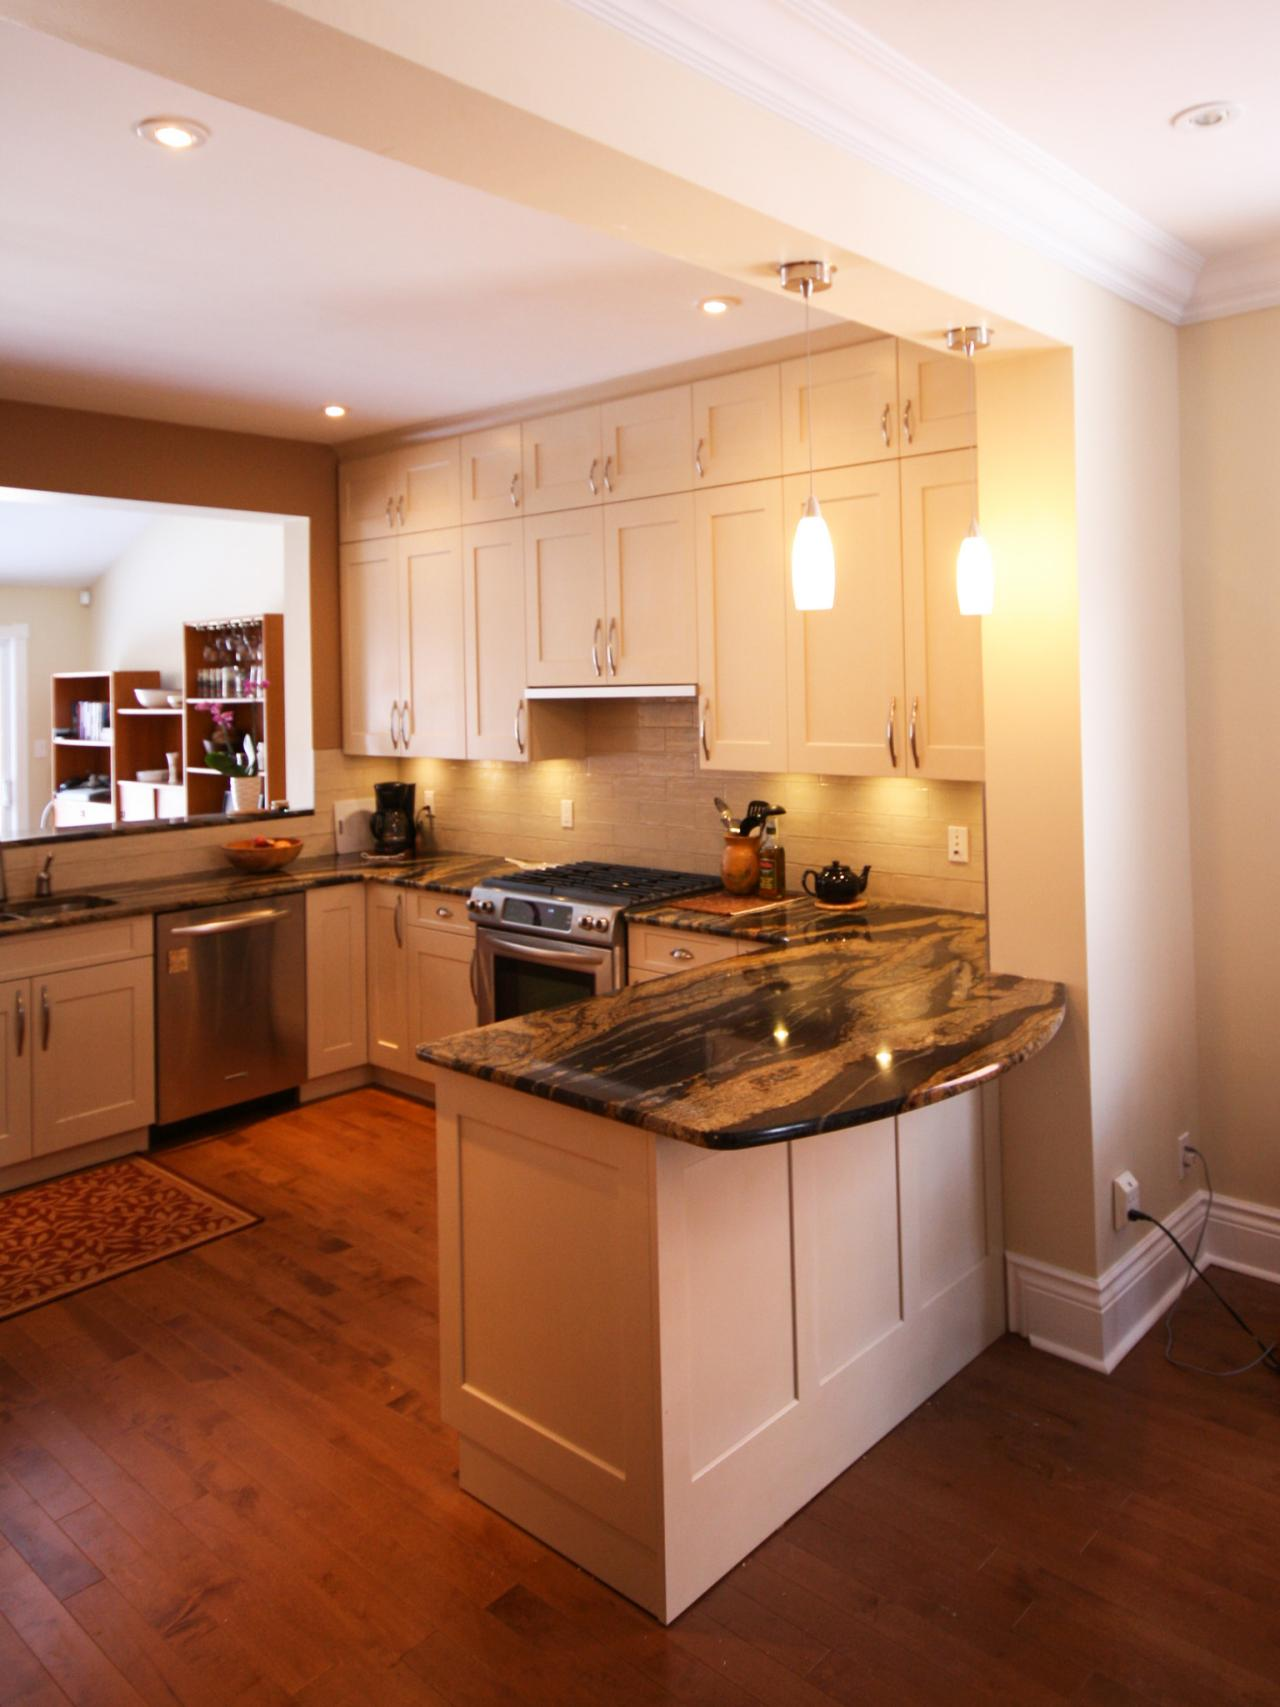 hgtv u shaped kitchen designs photo - 6